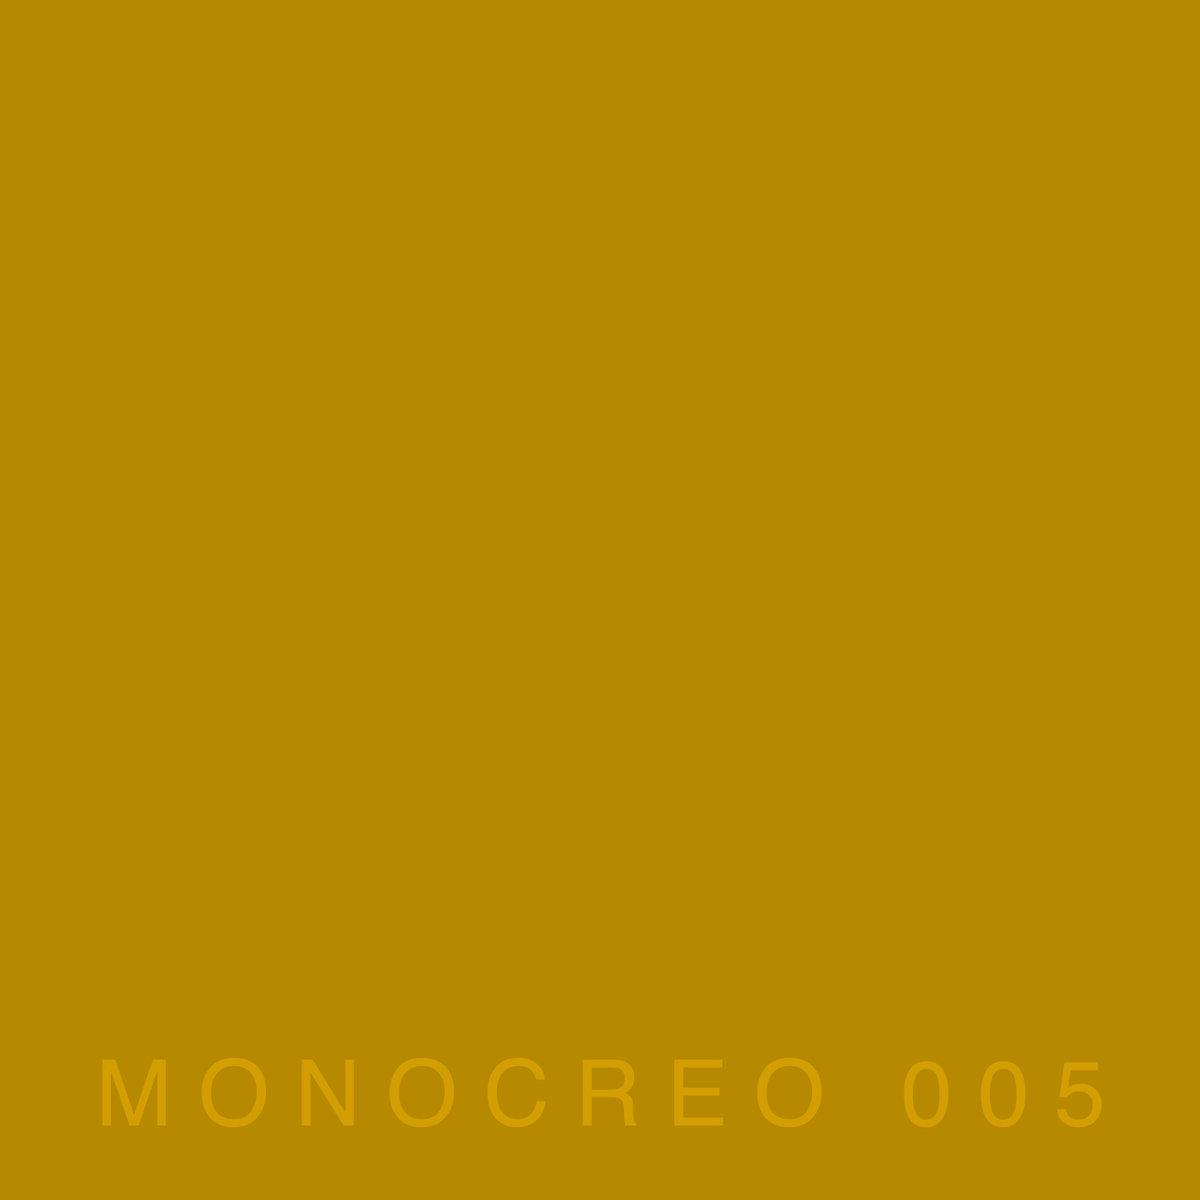 Alessandro Cau - Brenti - Monocreo - Bandcamp - 2019 - Sa Scena Sarda